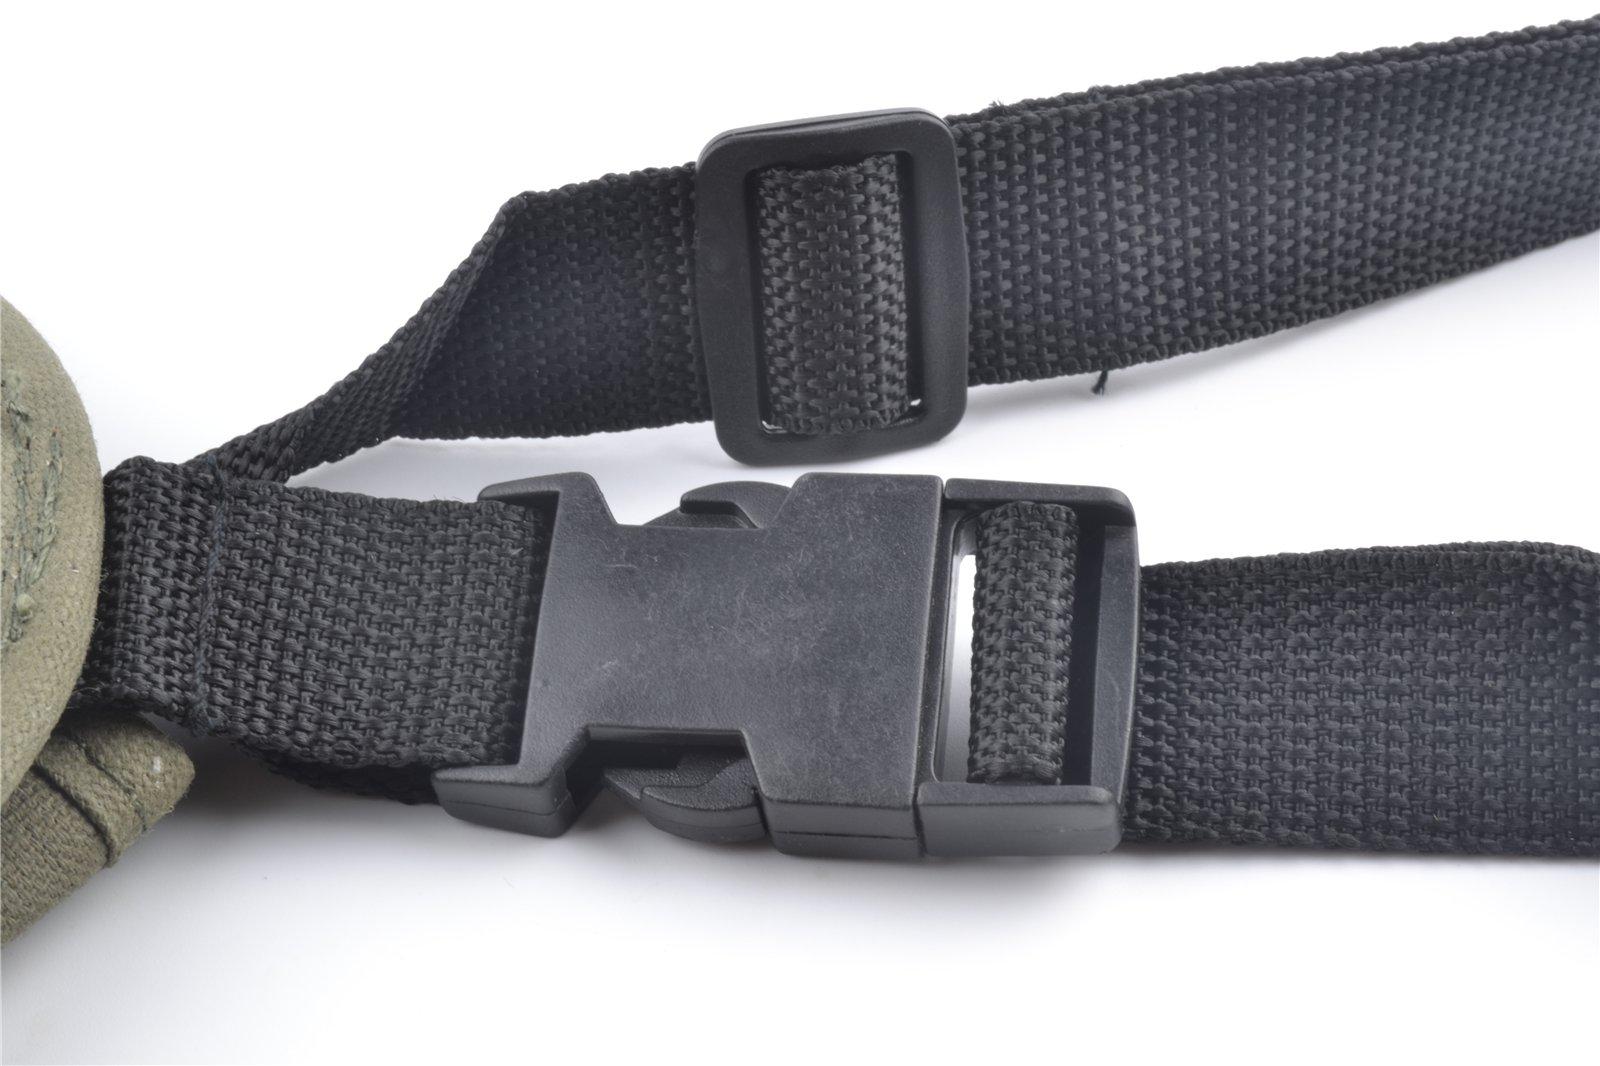 minihut Shoot Shoulder Pad Field Shield Recoil Reducer Shooting Shirt Vest for Shotgun Rifle